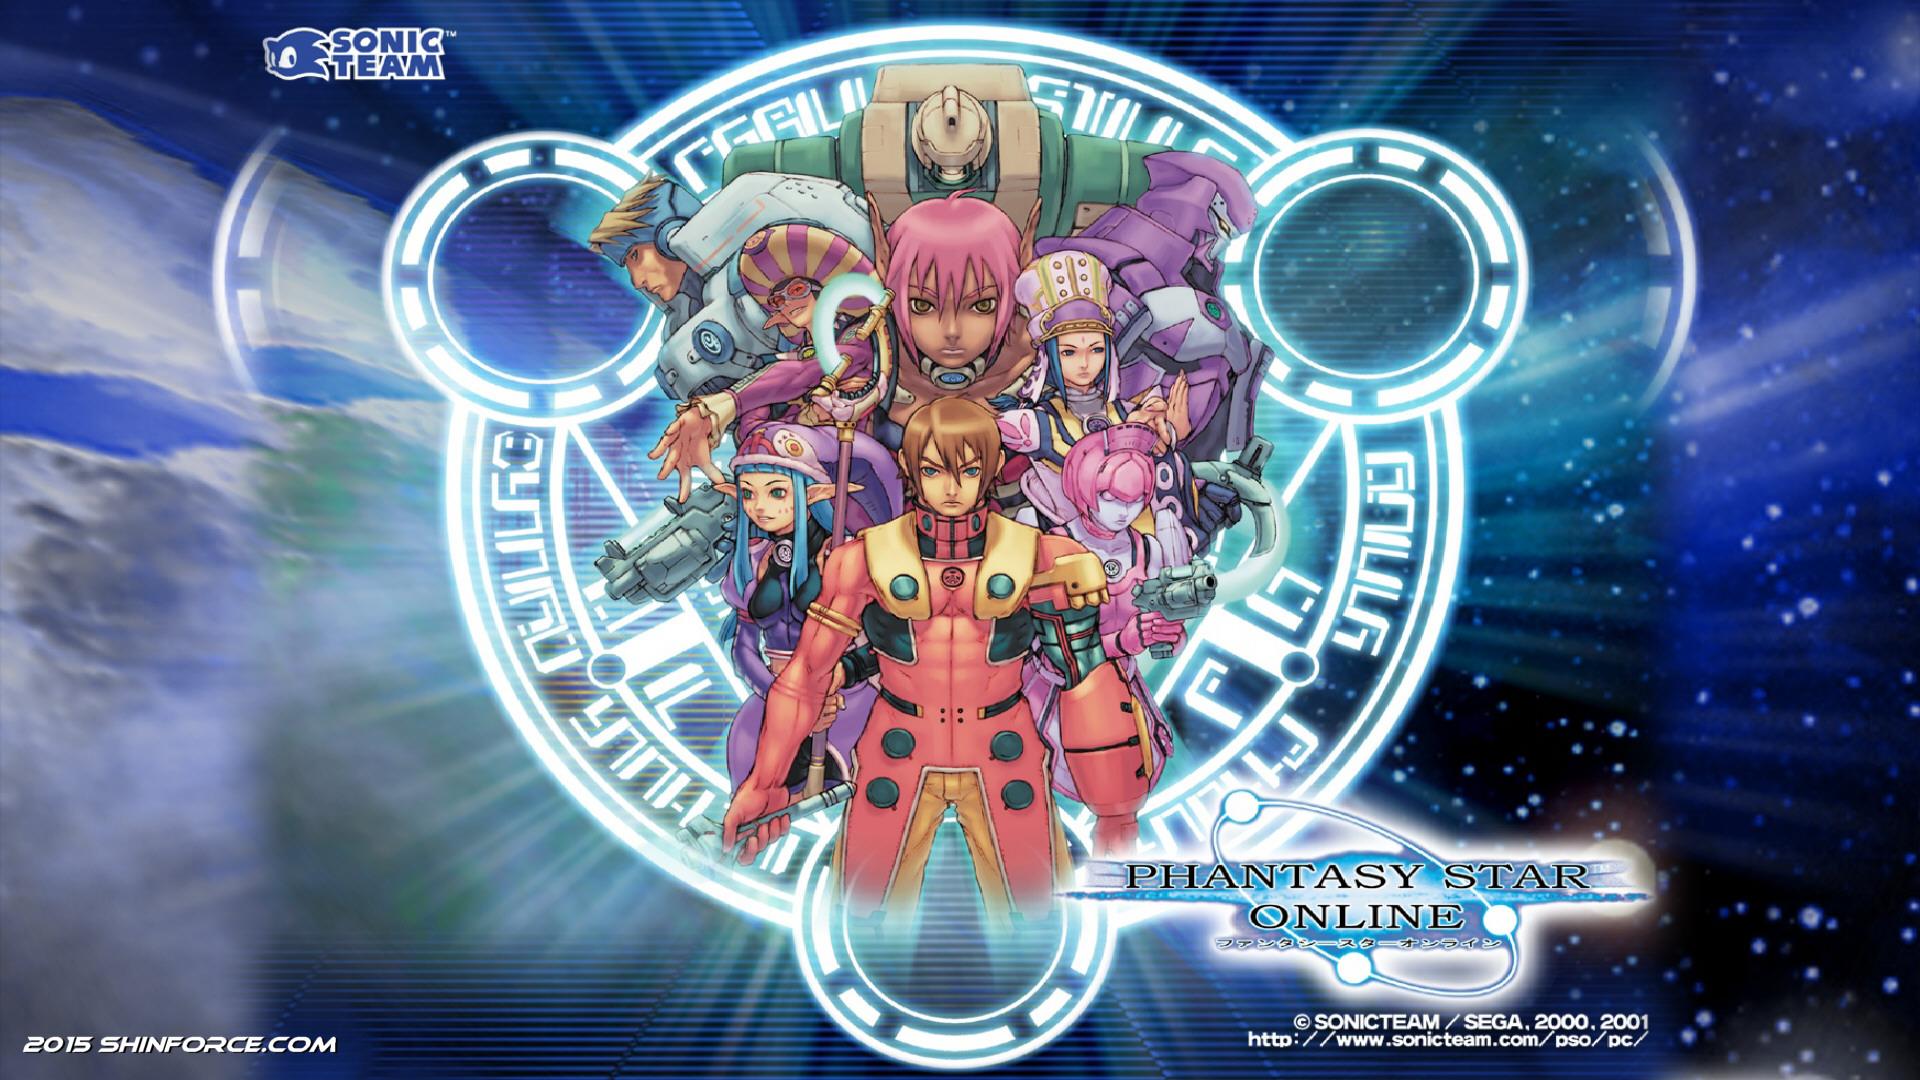 10. Phantasy Star Online -